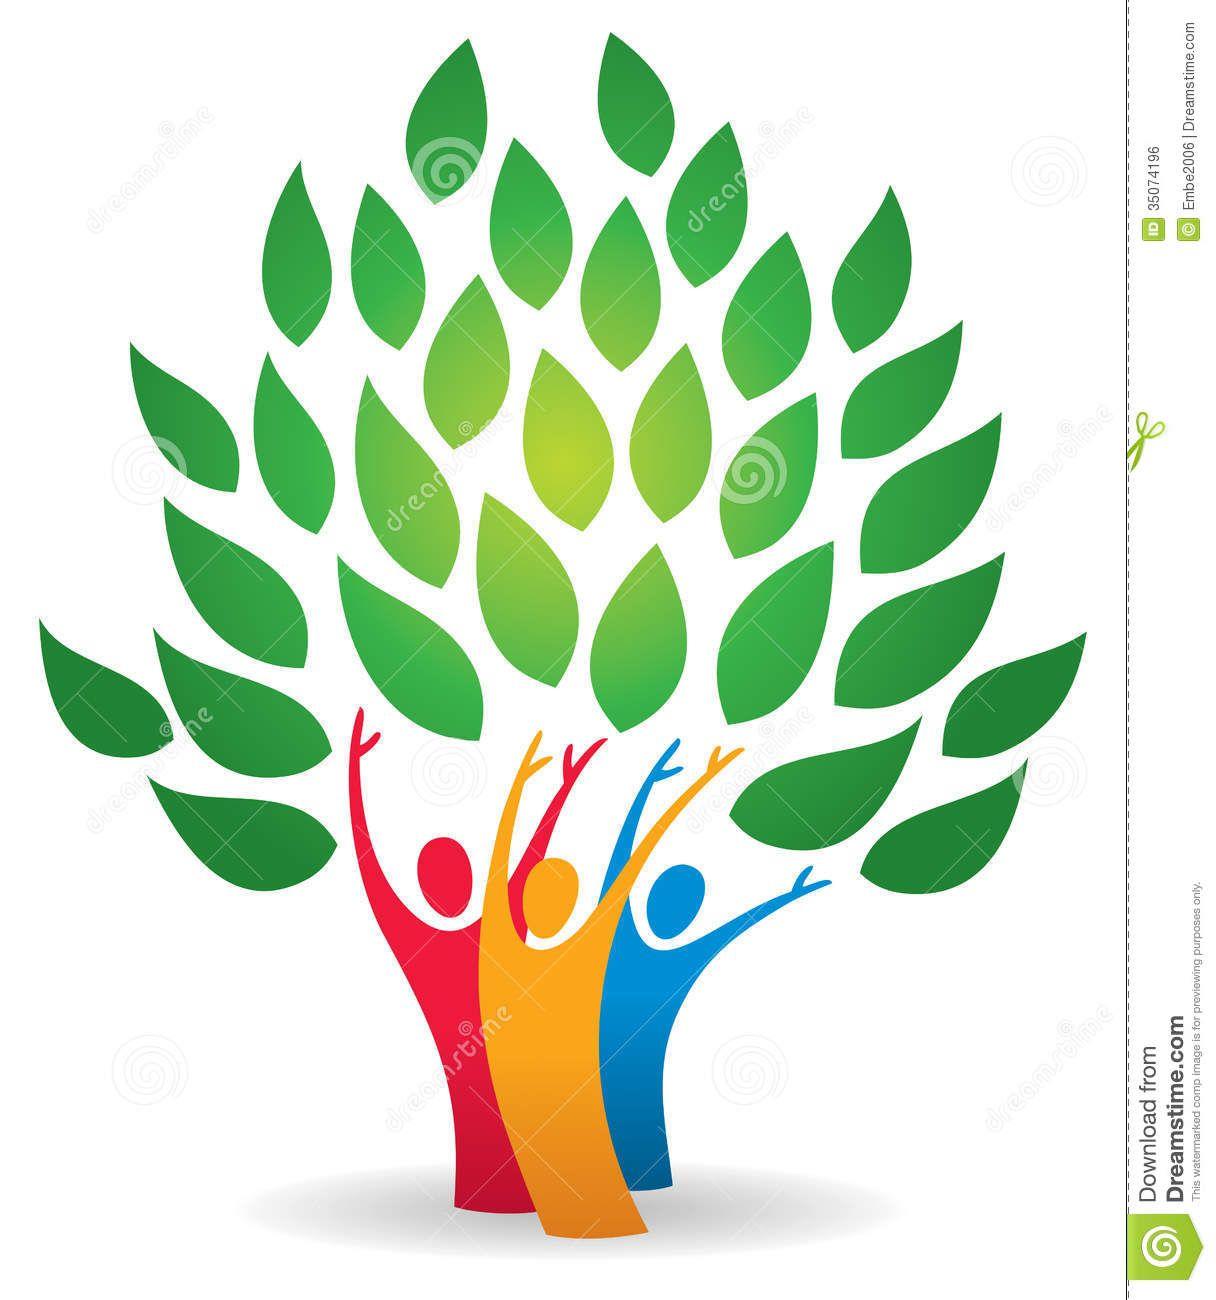 Family Tree Logo Family tree logo, Tree logos, Tree icon